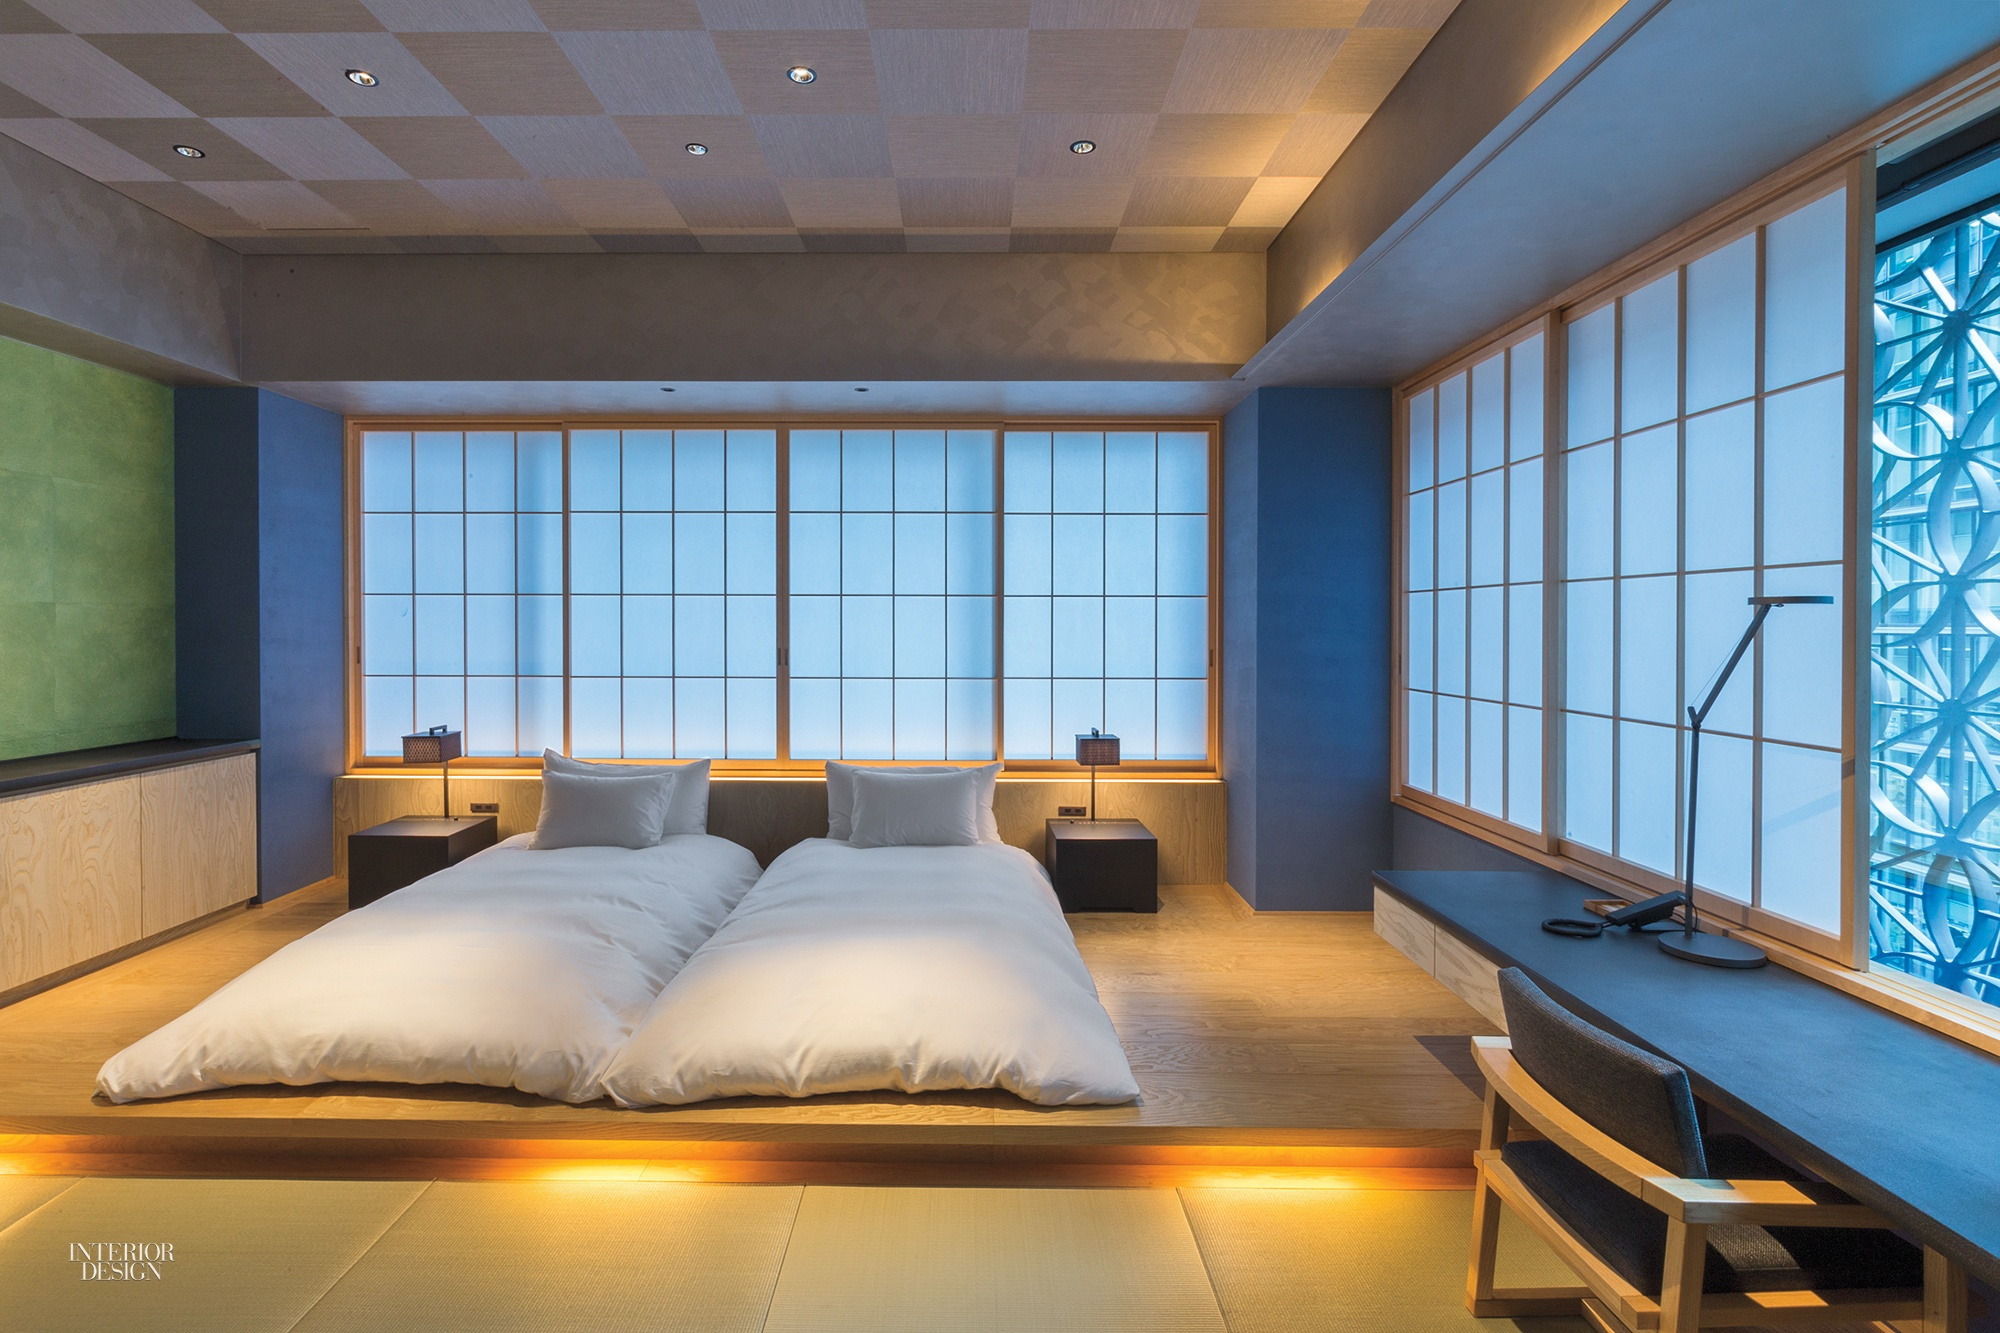 Hoshinoya Tokyo Spa Hotel By Rie Azuma Reinvents The